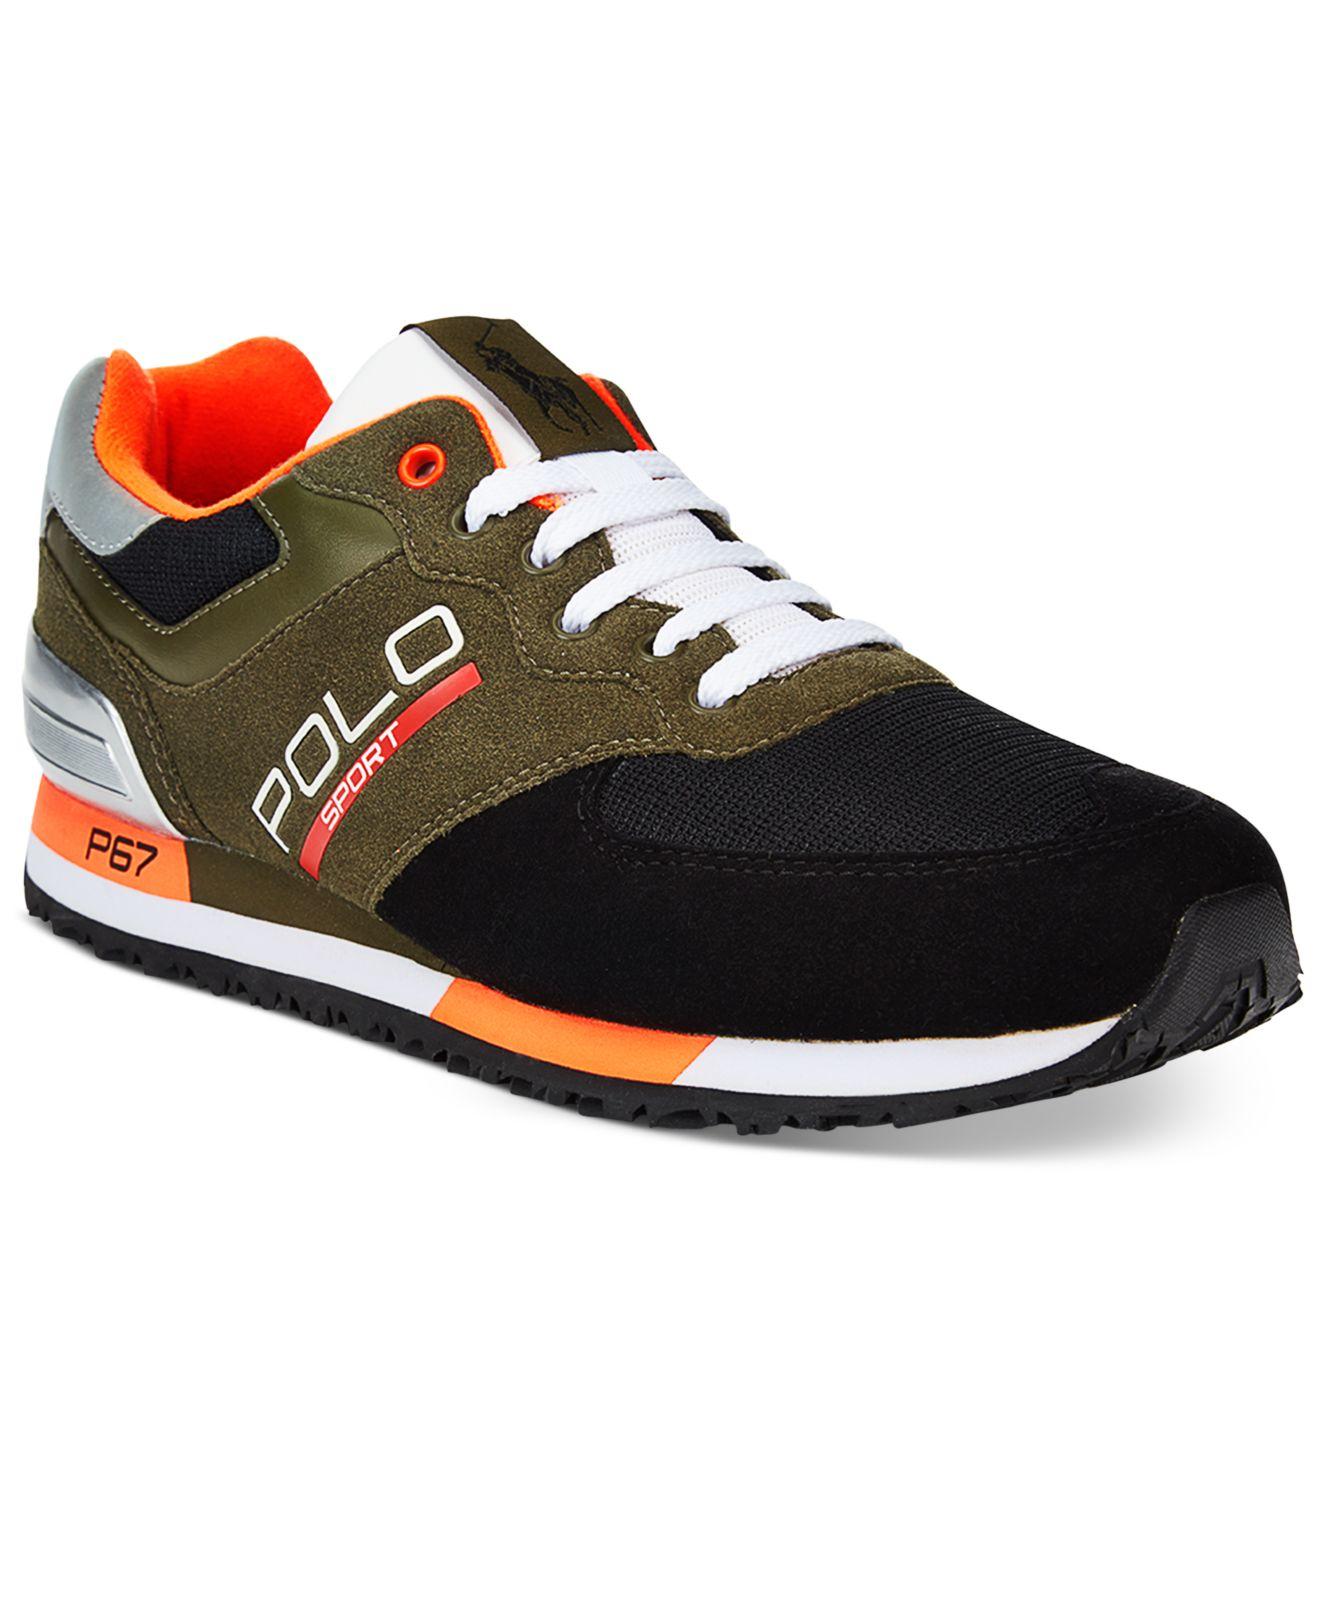 Polo Ralph Lauren Womens Casual Shoes